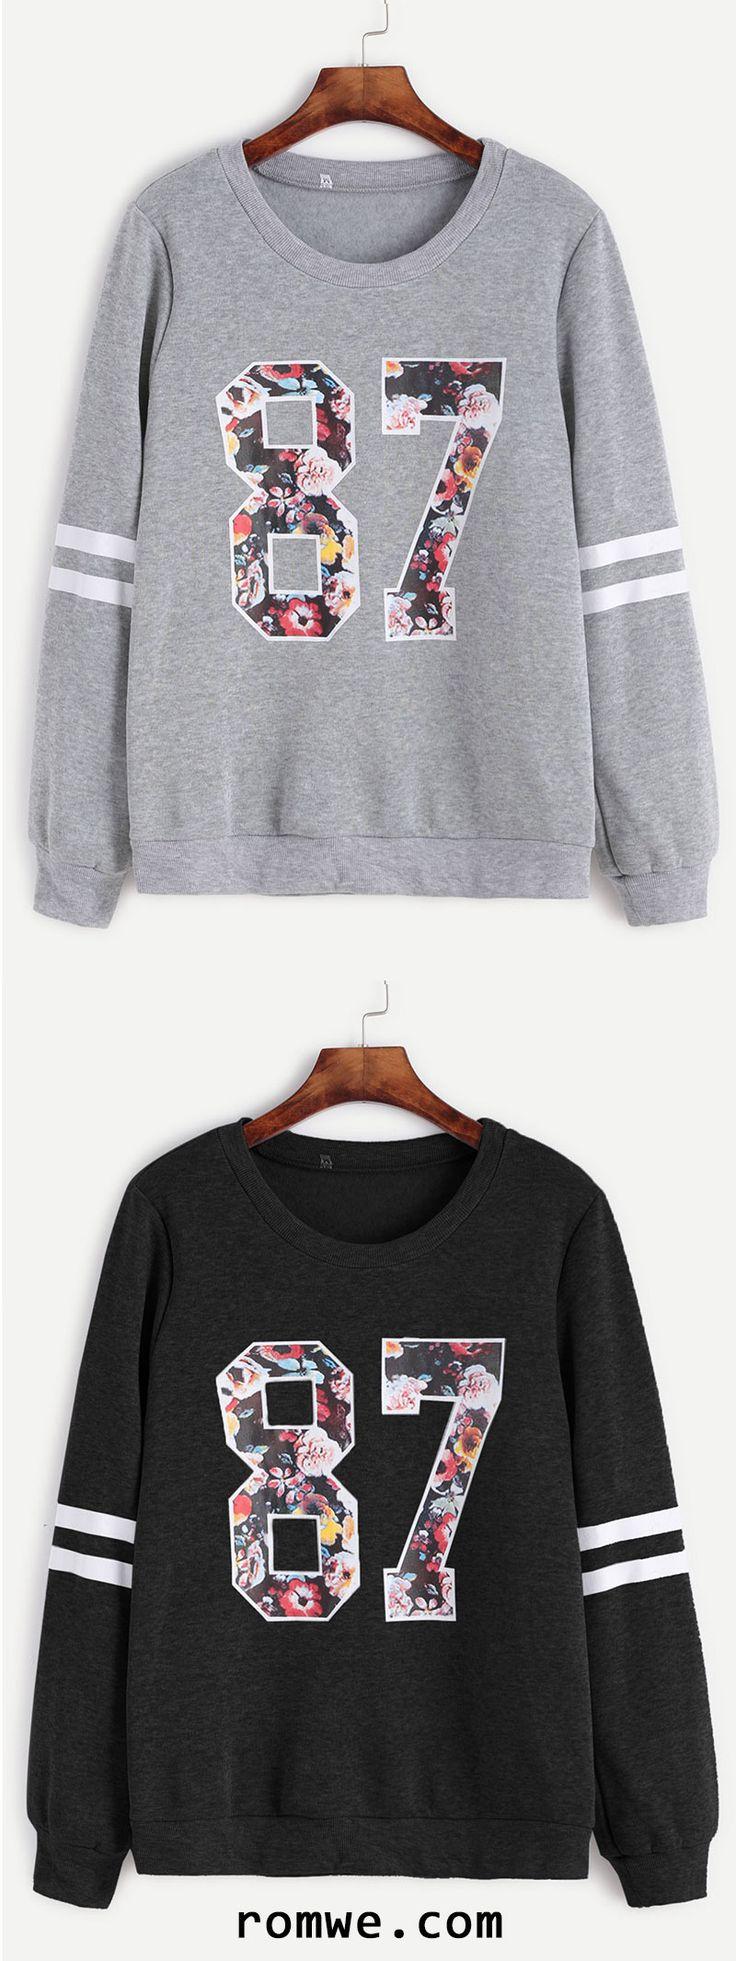 Varsity Print Sweatshirt